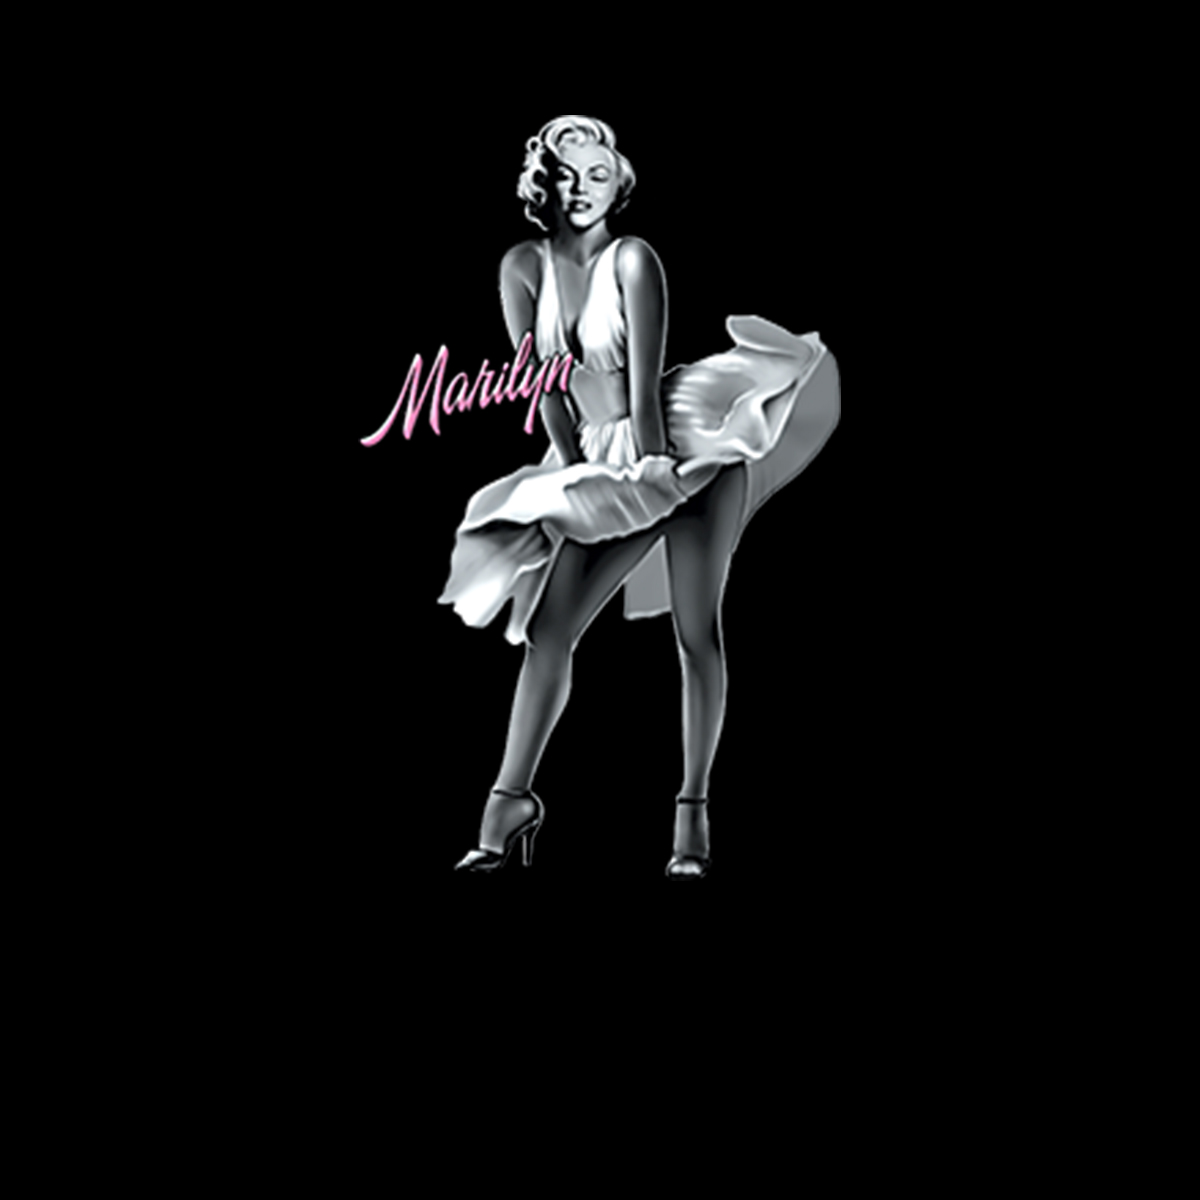 Marilyn-Monroe-Vestito-Bianco-Film-Donna-T-shirt-XS-3XL